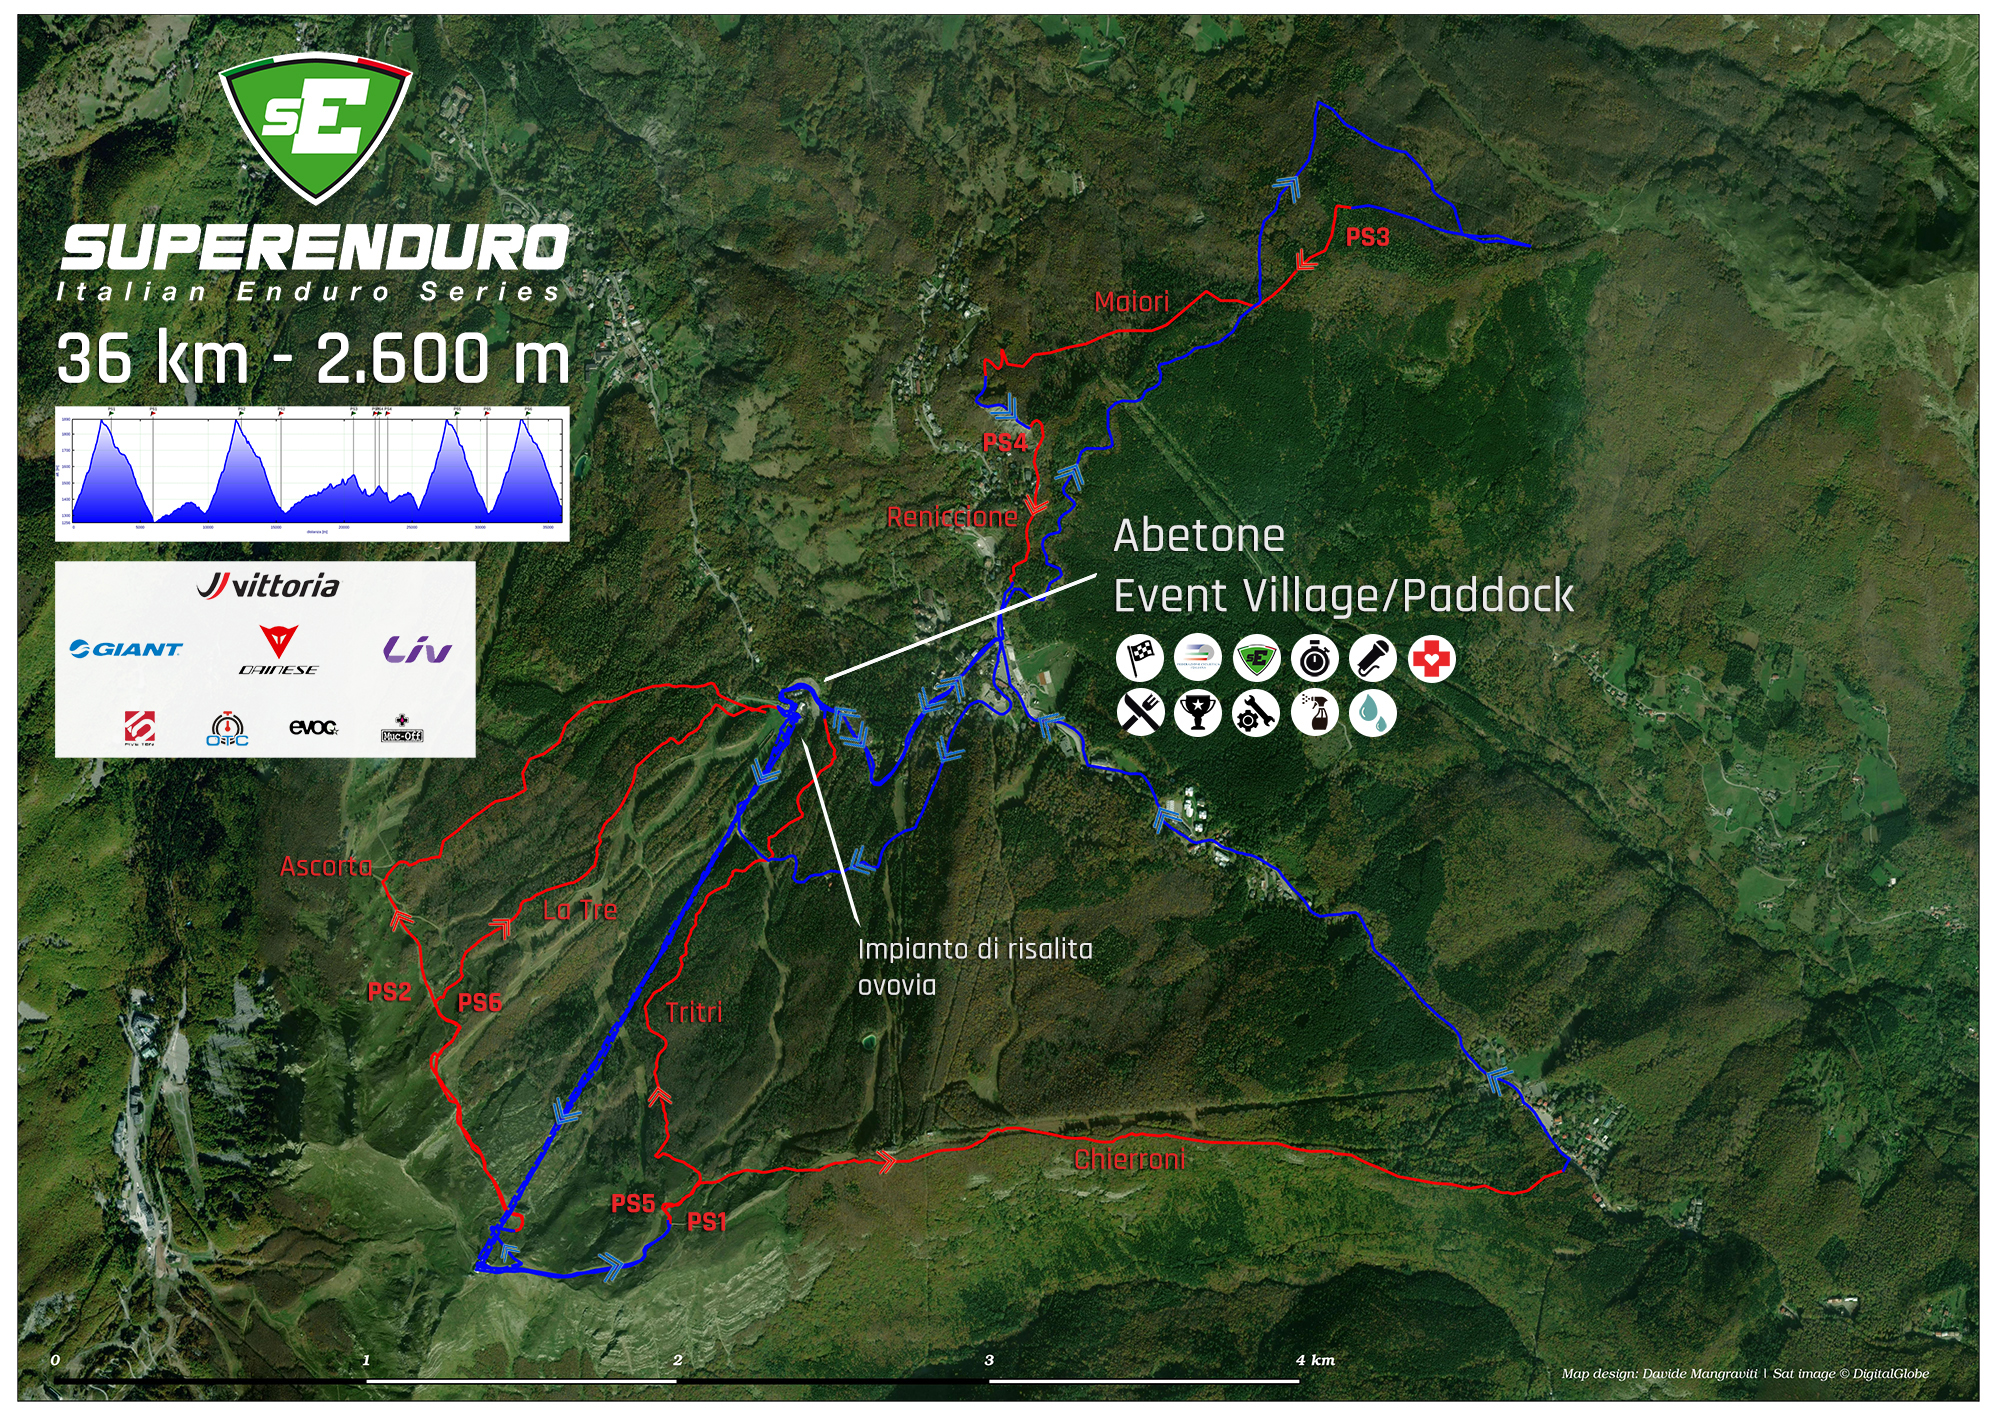 Abetone-Superenduro-Mappa